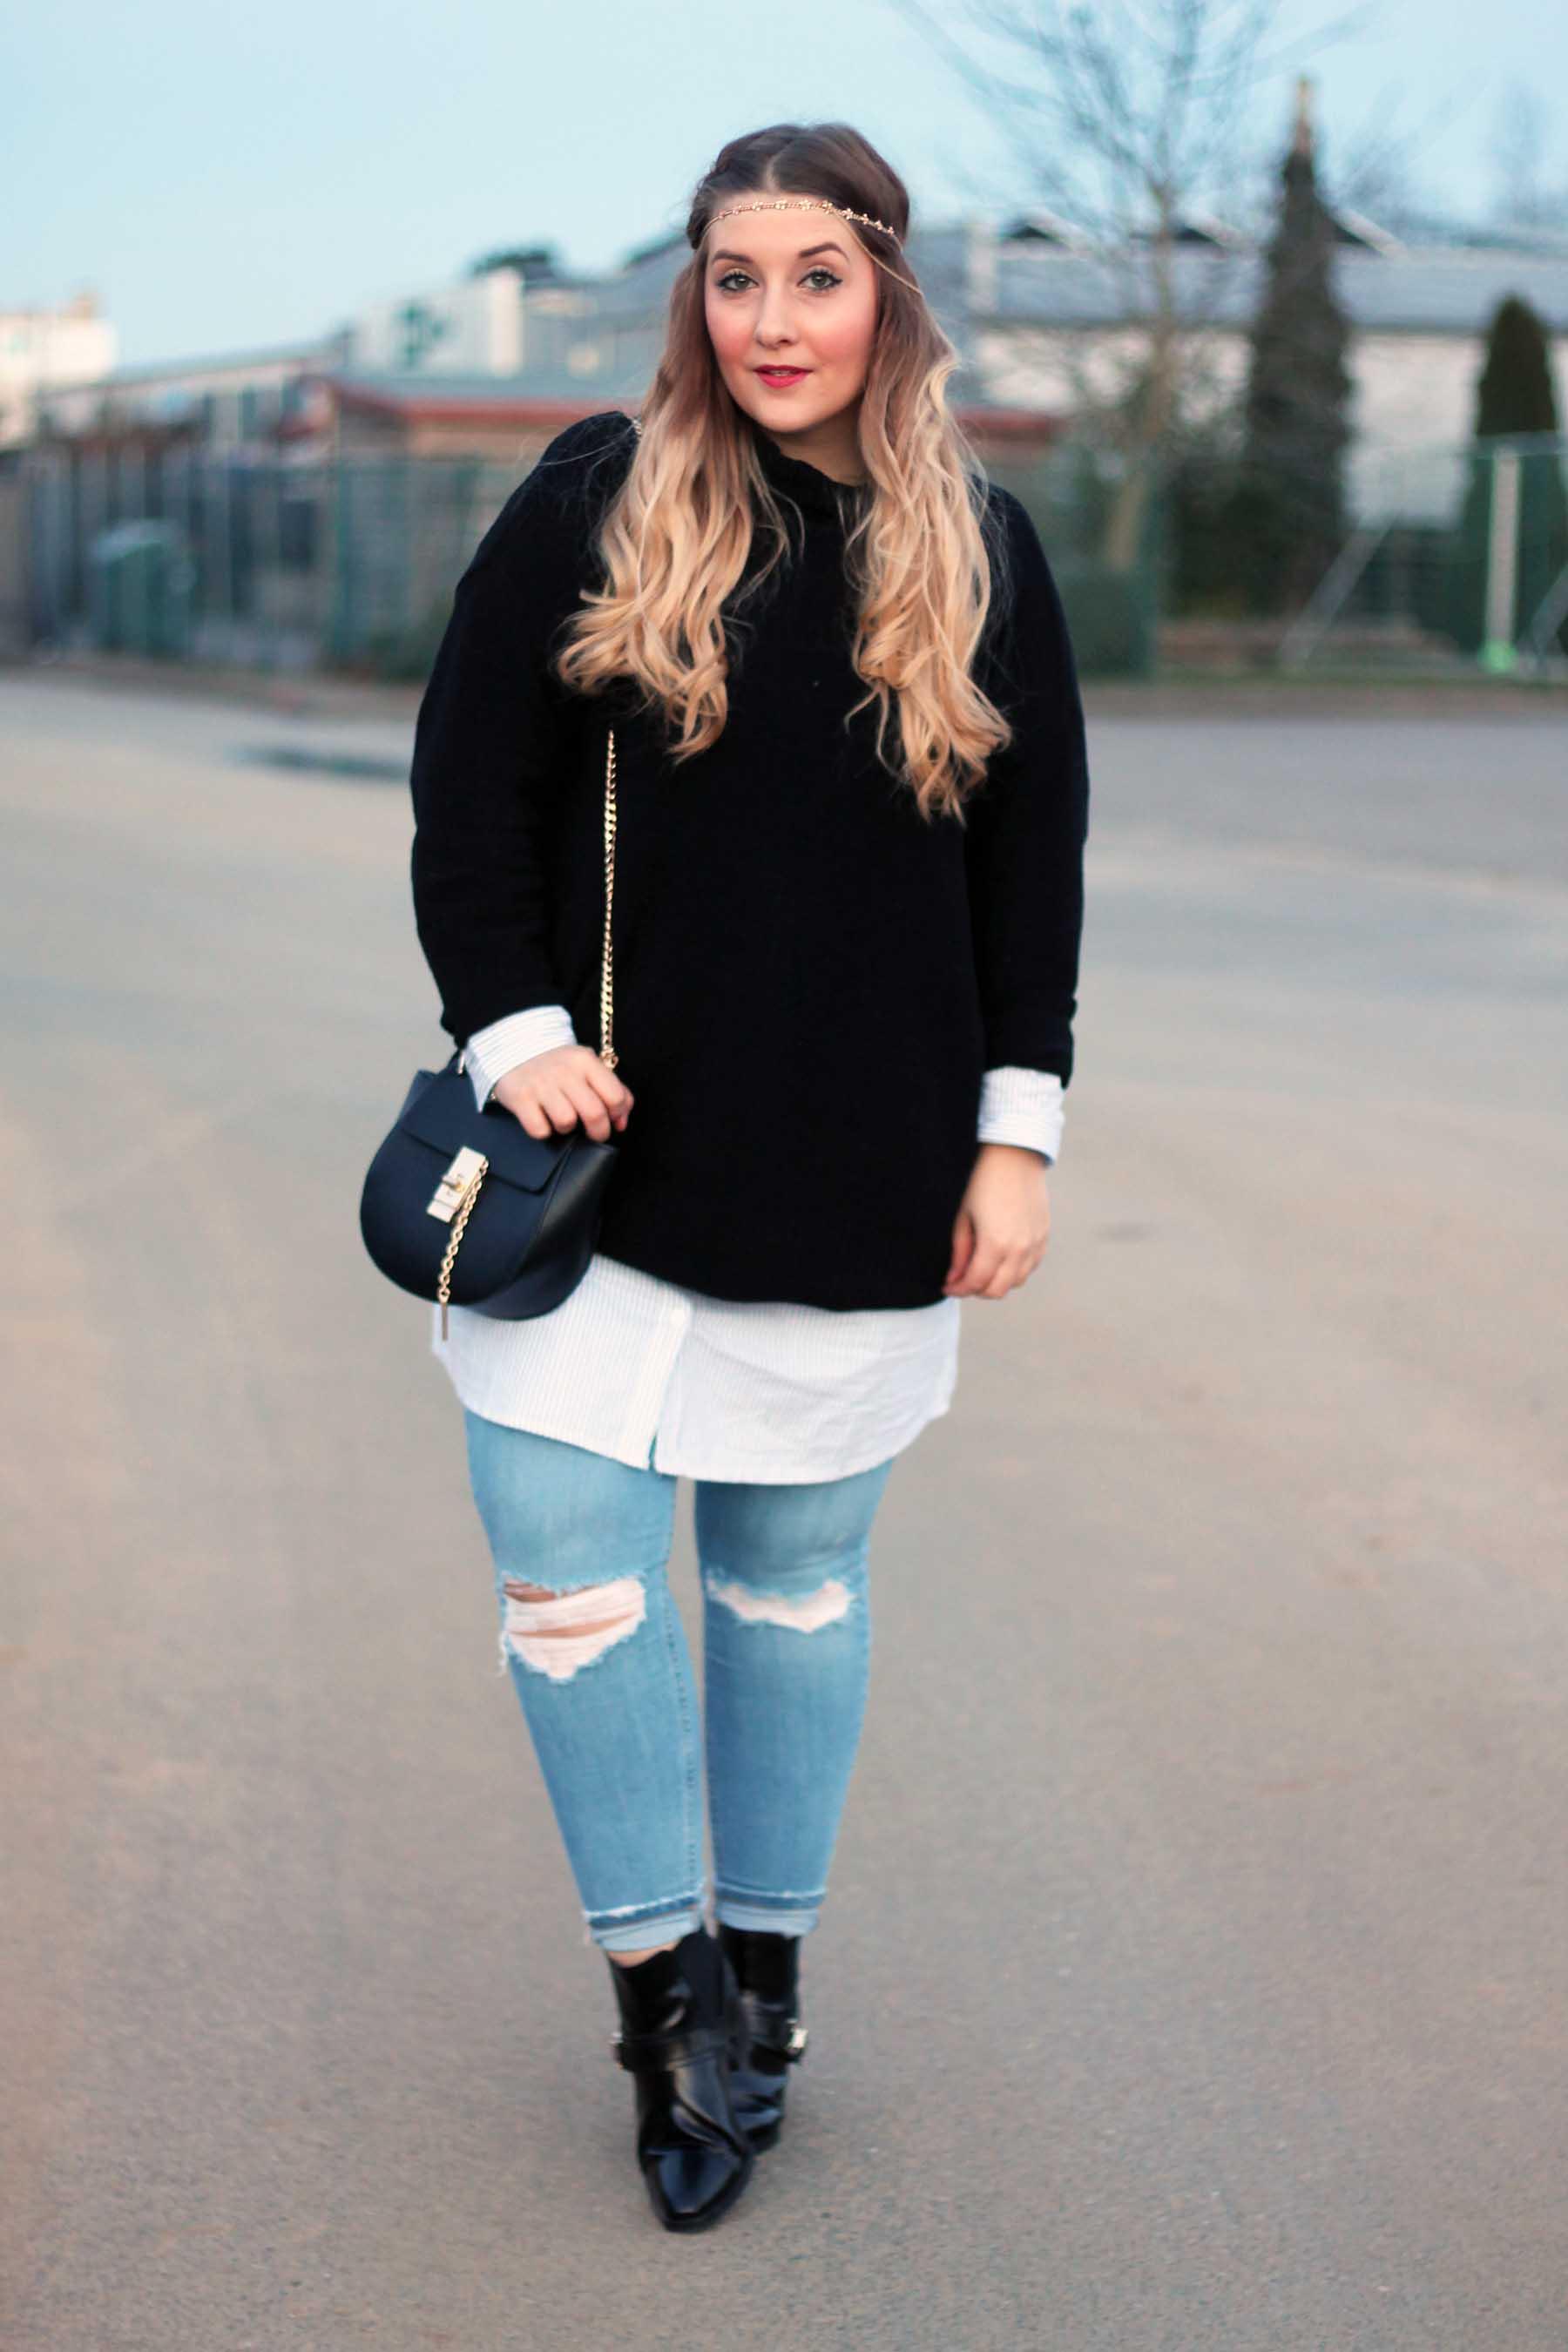 outfit-modeblog-fashionblog-ostern-look-drew-tasche-chloe-jeans-hemdkleid